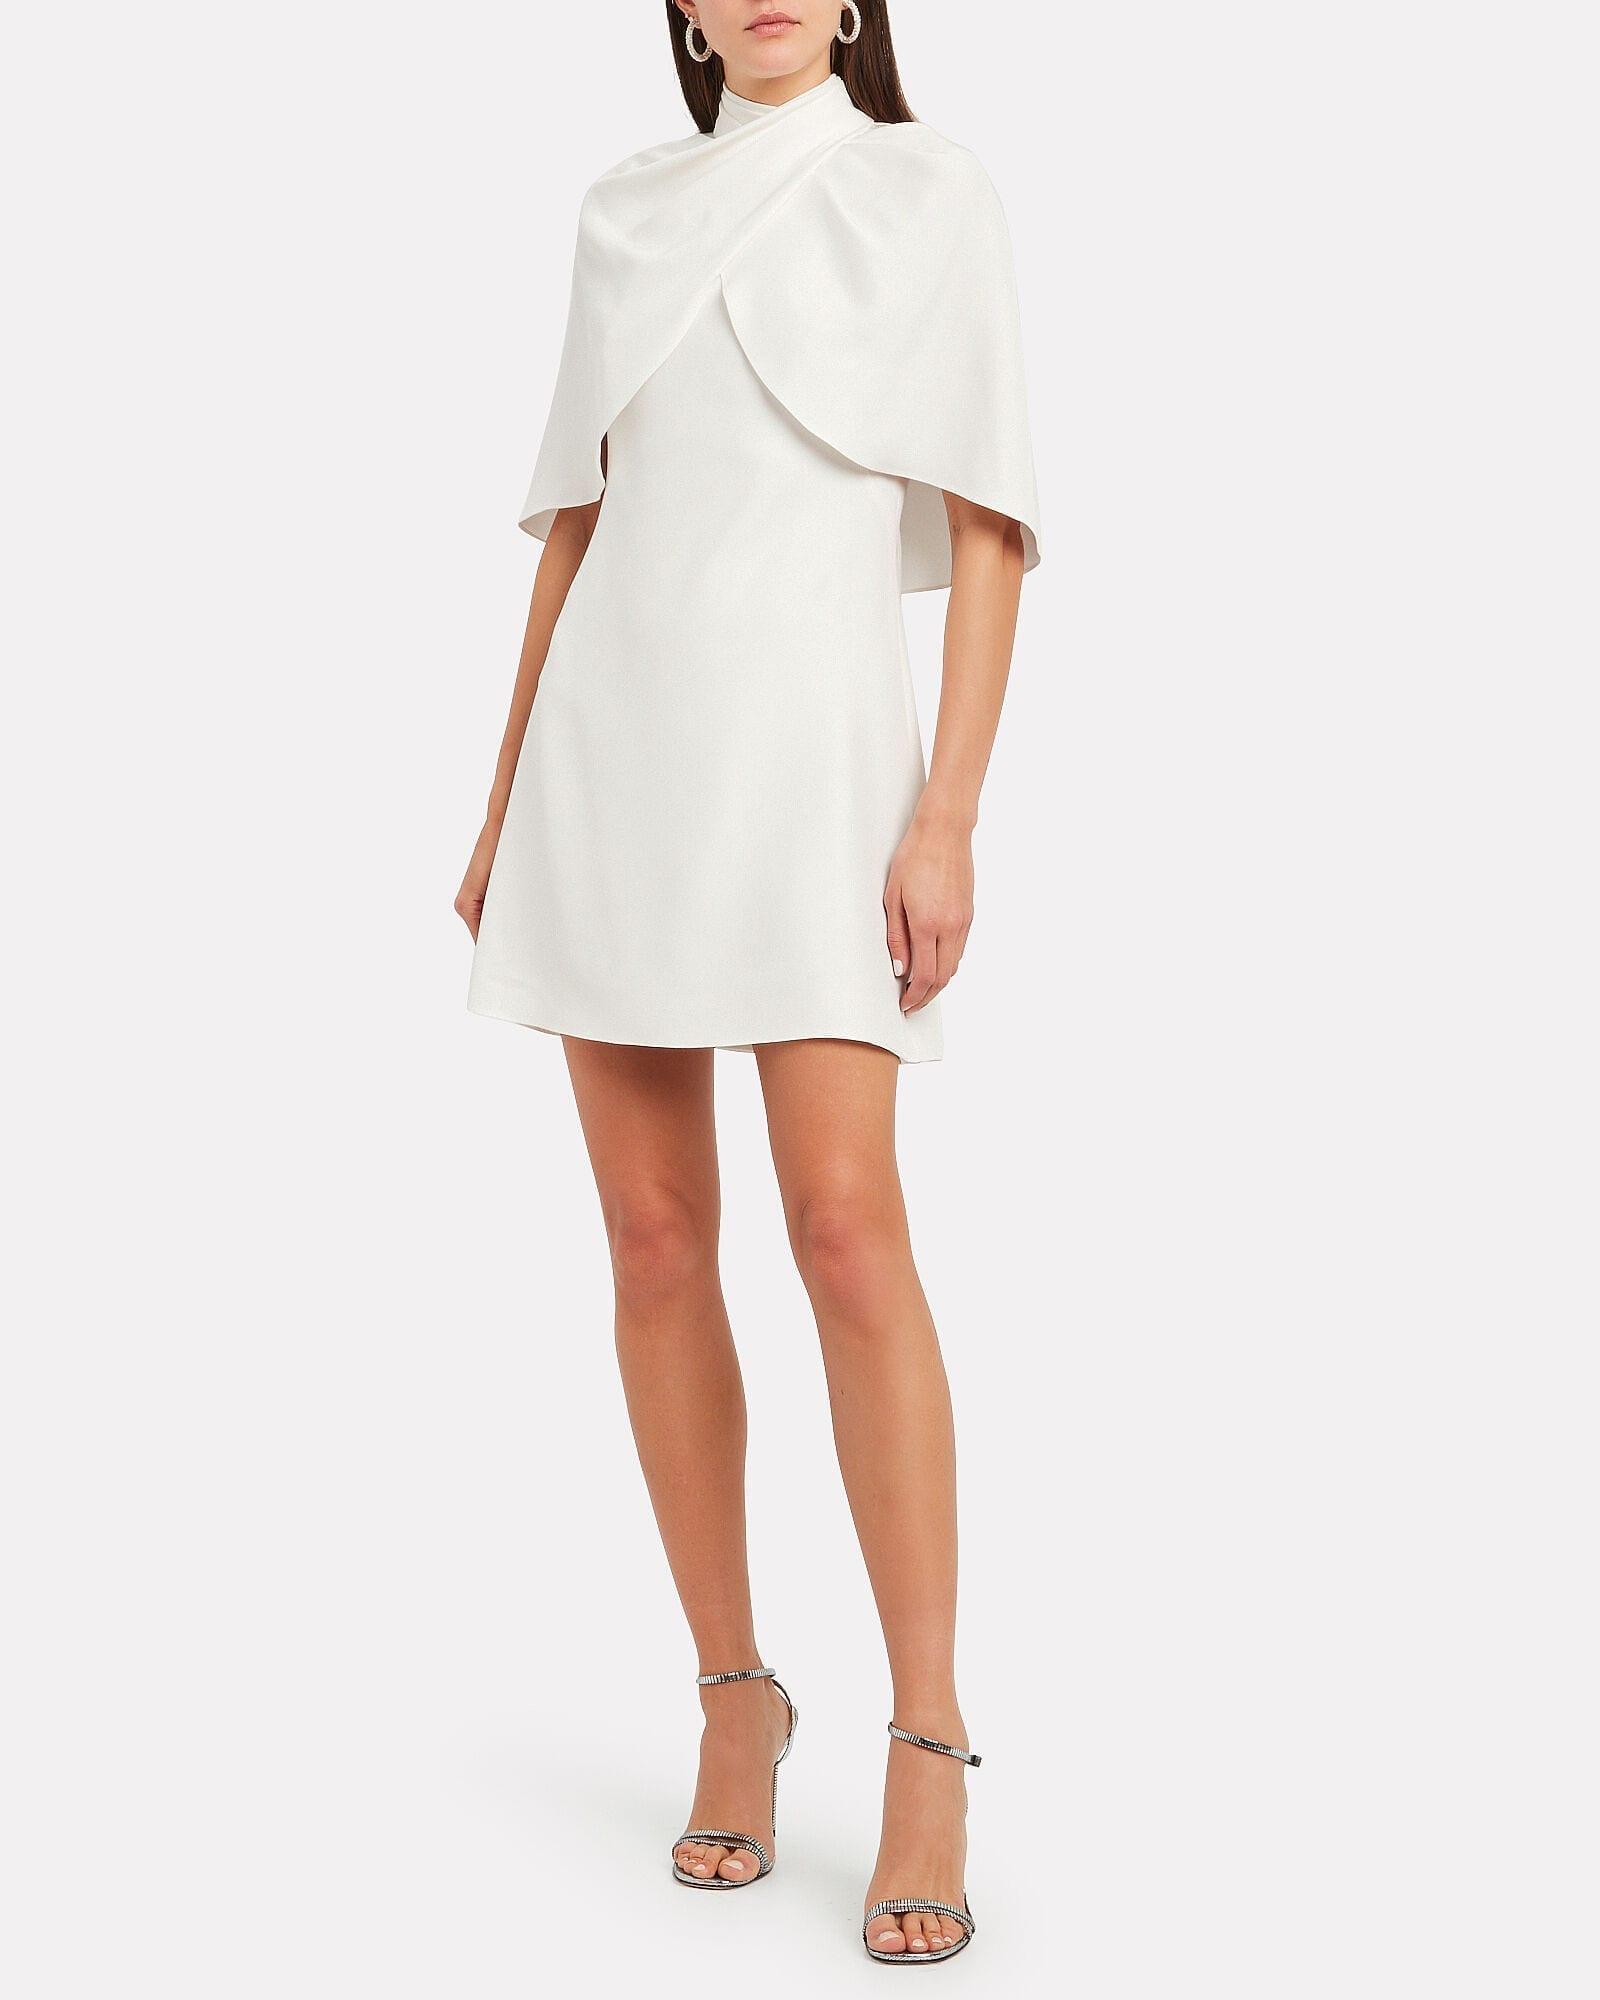 BRANDON MAXWELL Cape Silk Satin Dress